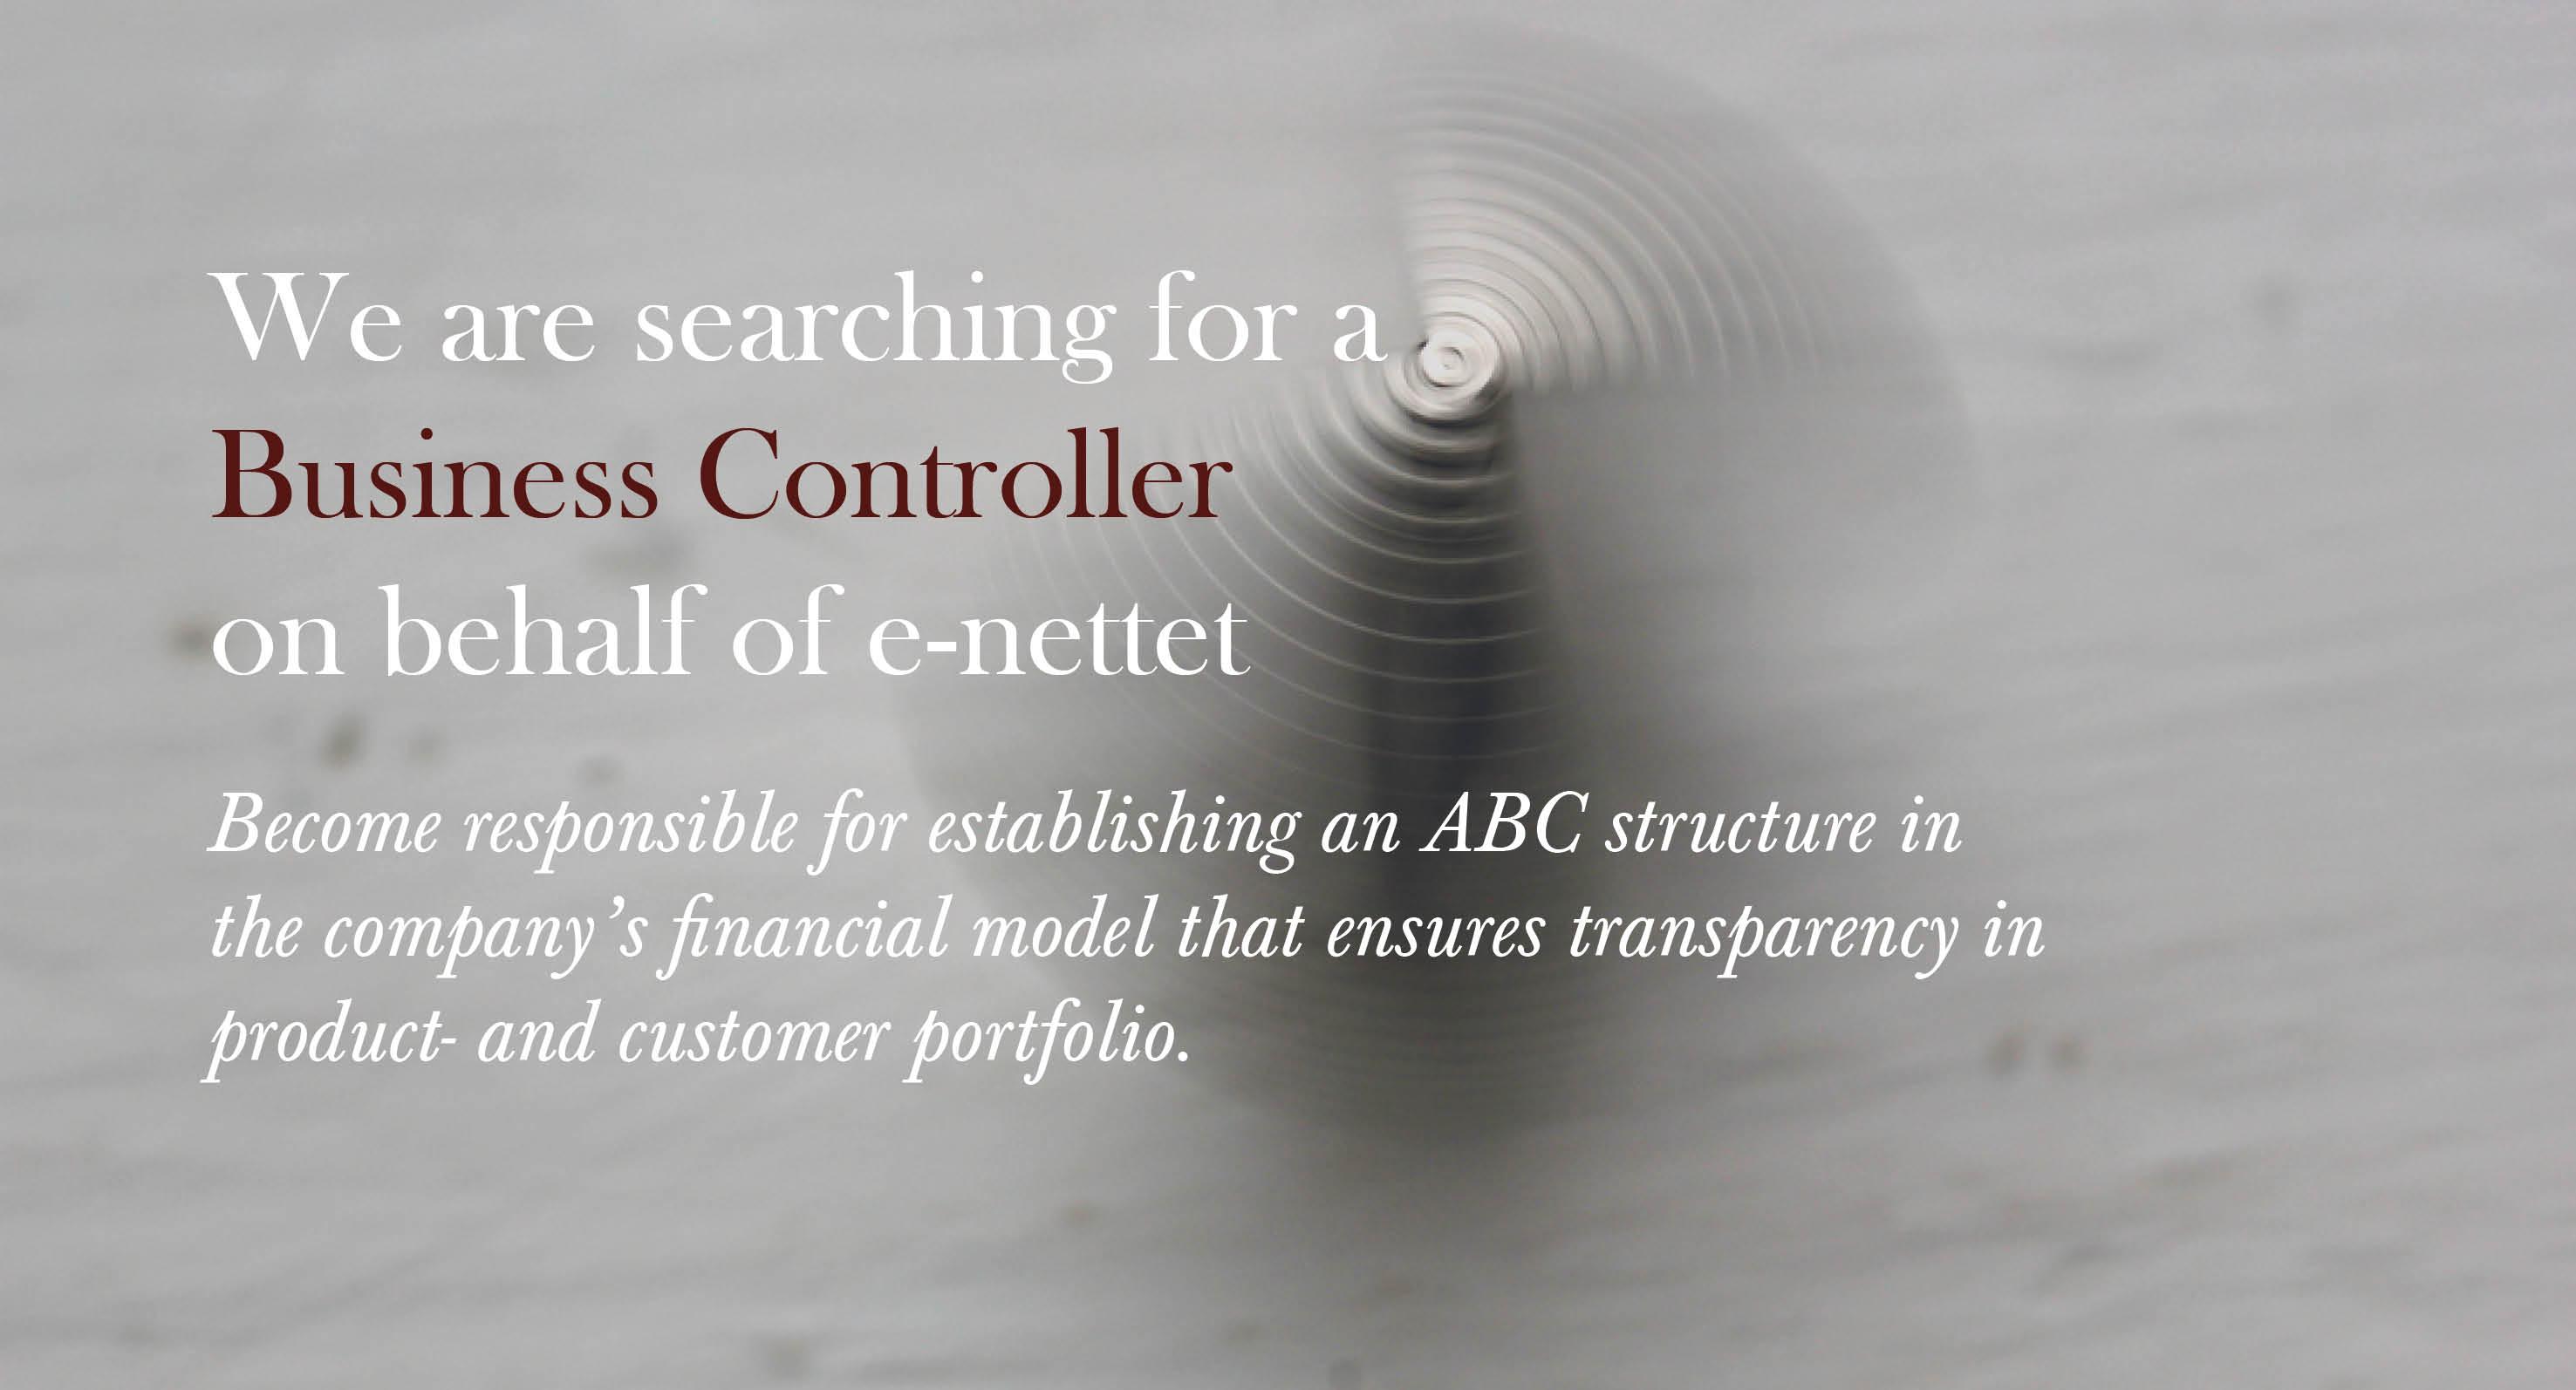 e-nettet - Business Controller (EN)